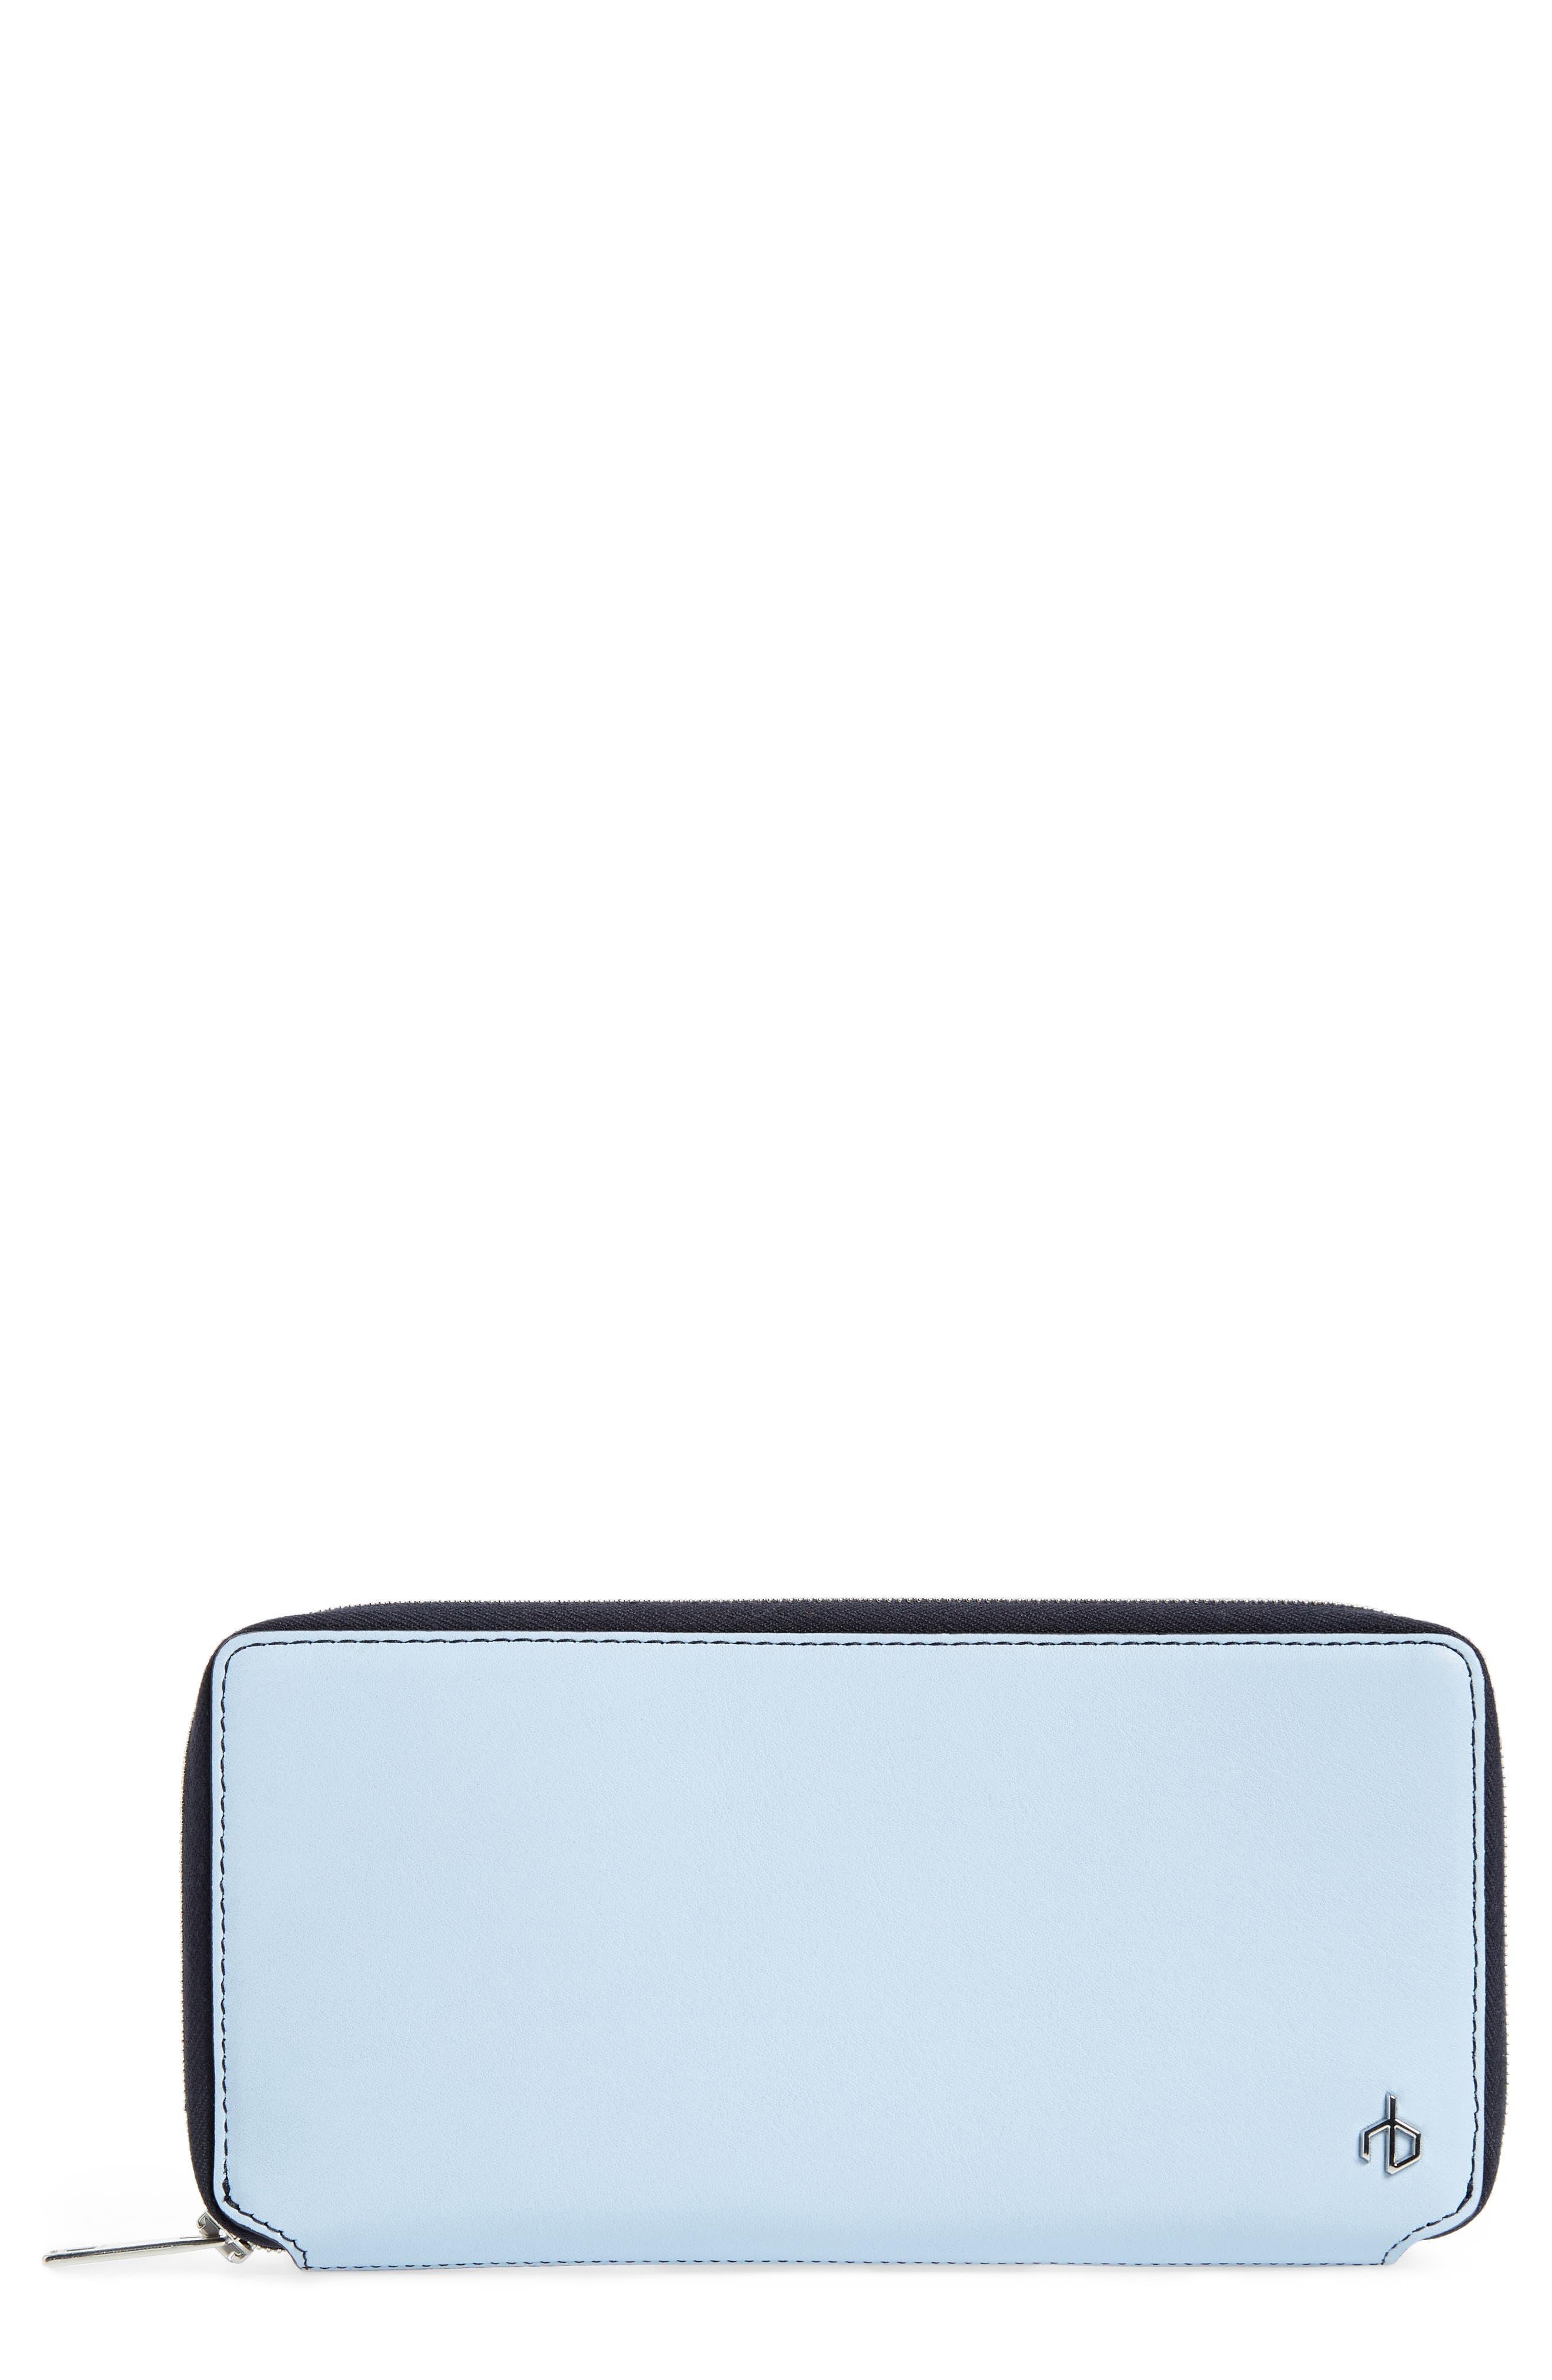 Calfskin Leather Zip-Around Wallet,                         Main,                         color, 402